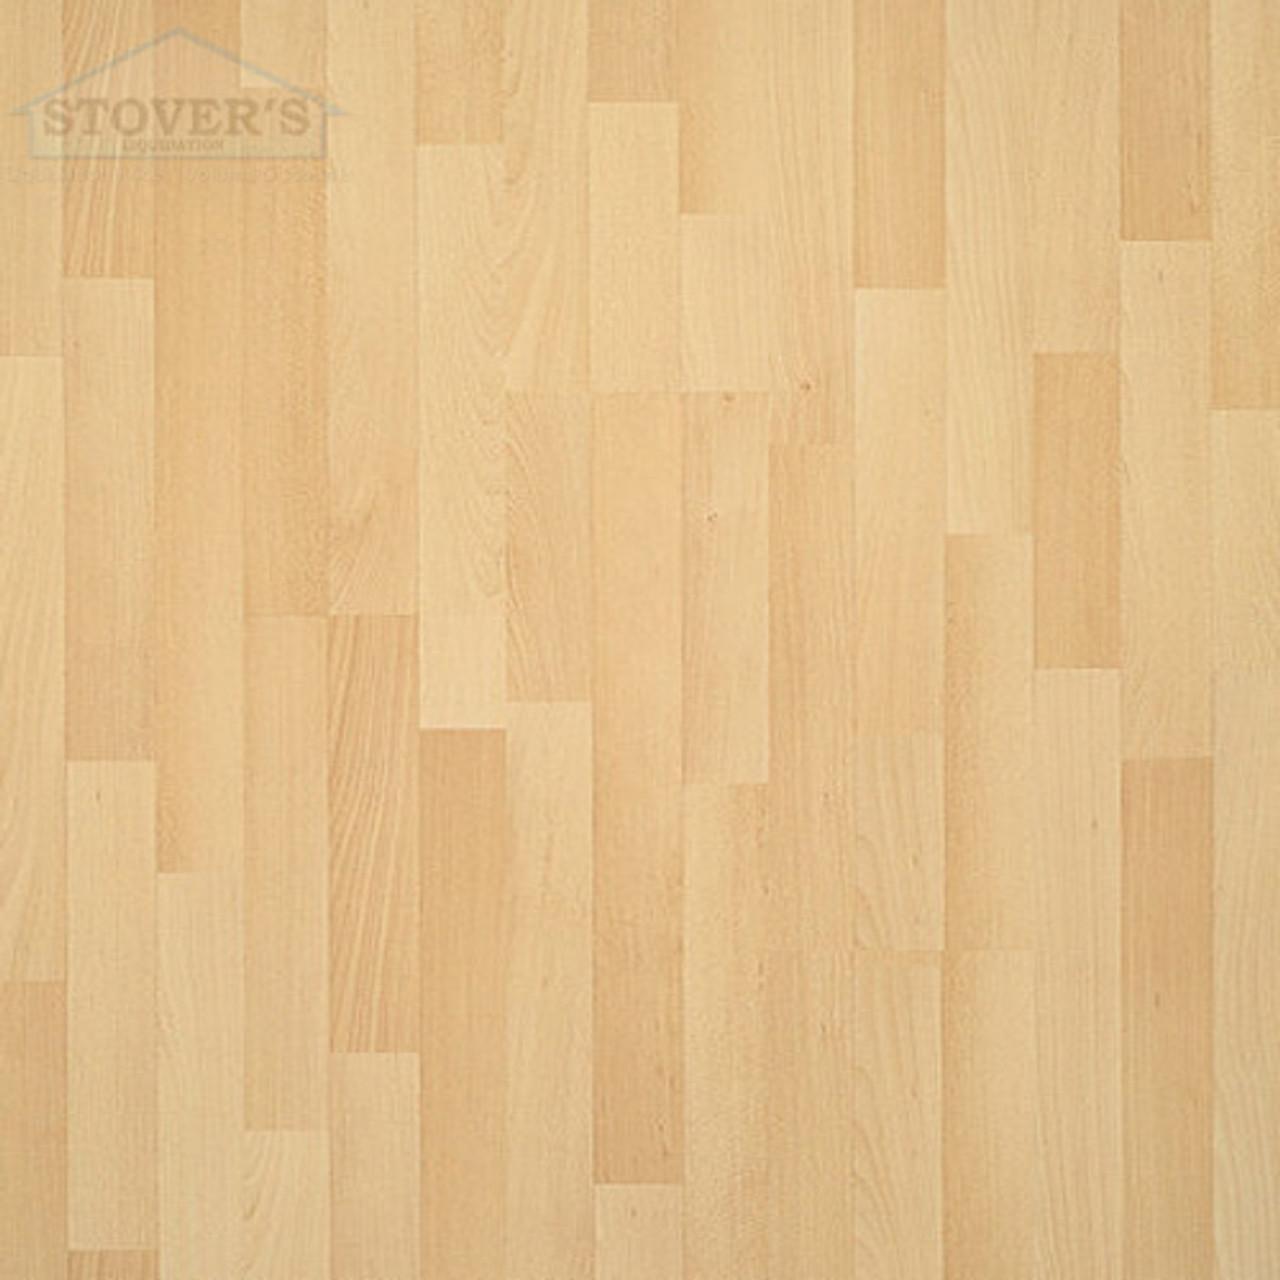 American Beech | Laminate Flooring | MKLMNT33276-415 |